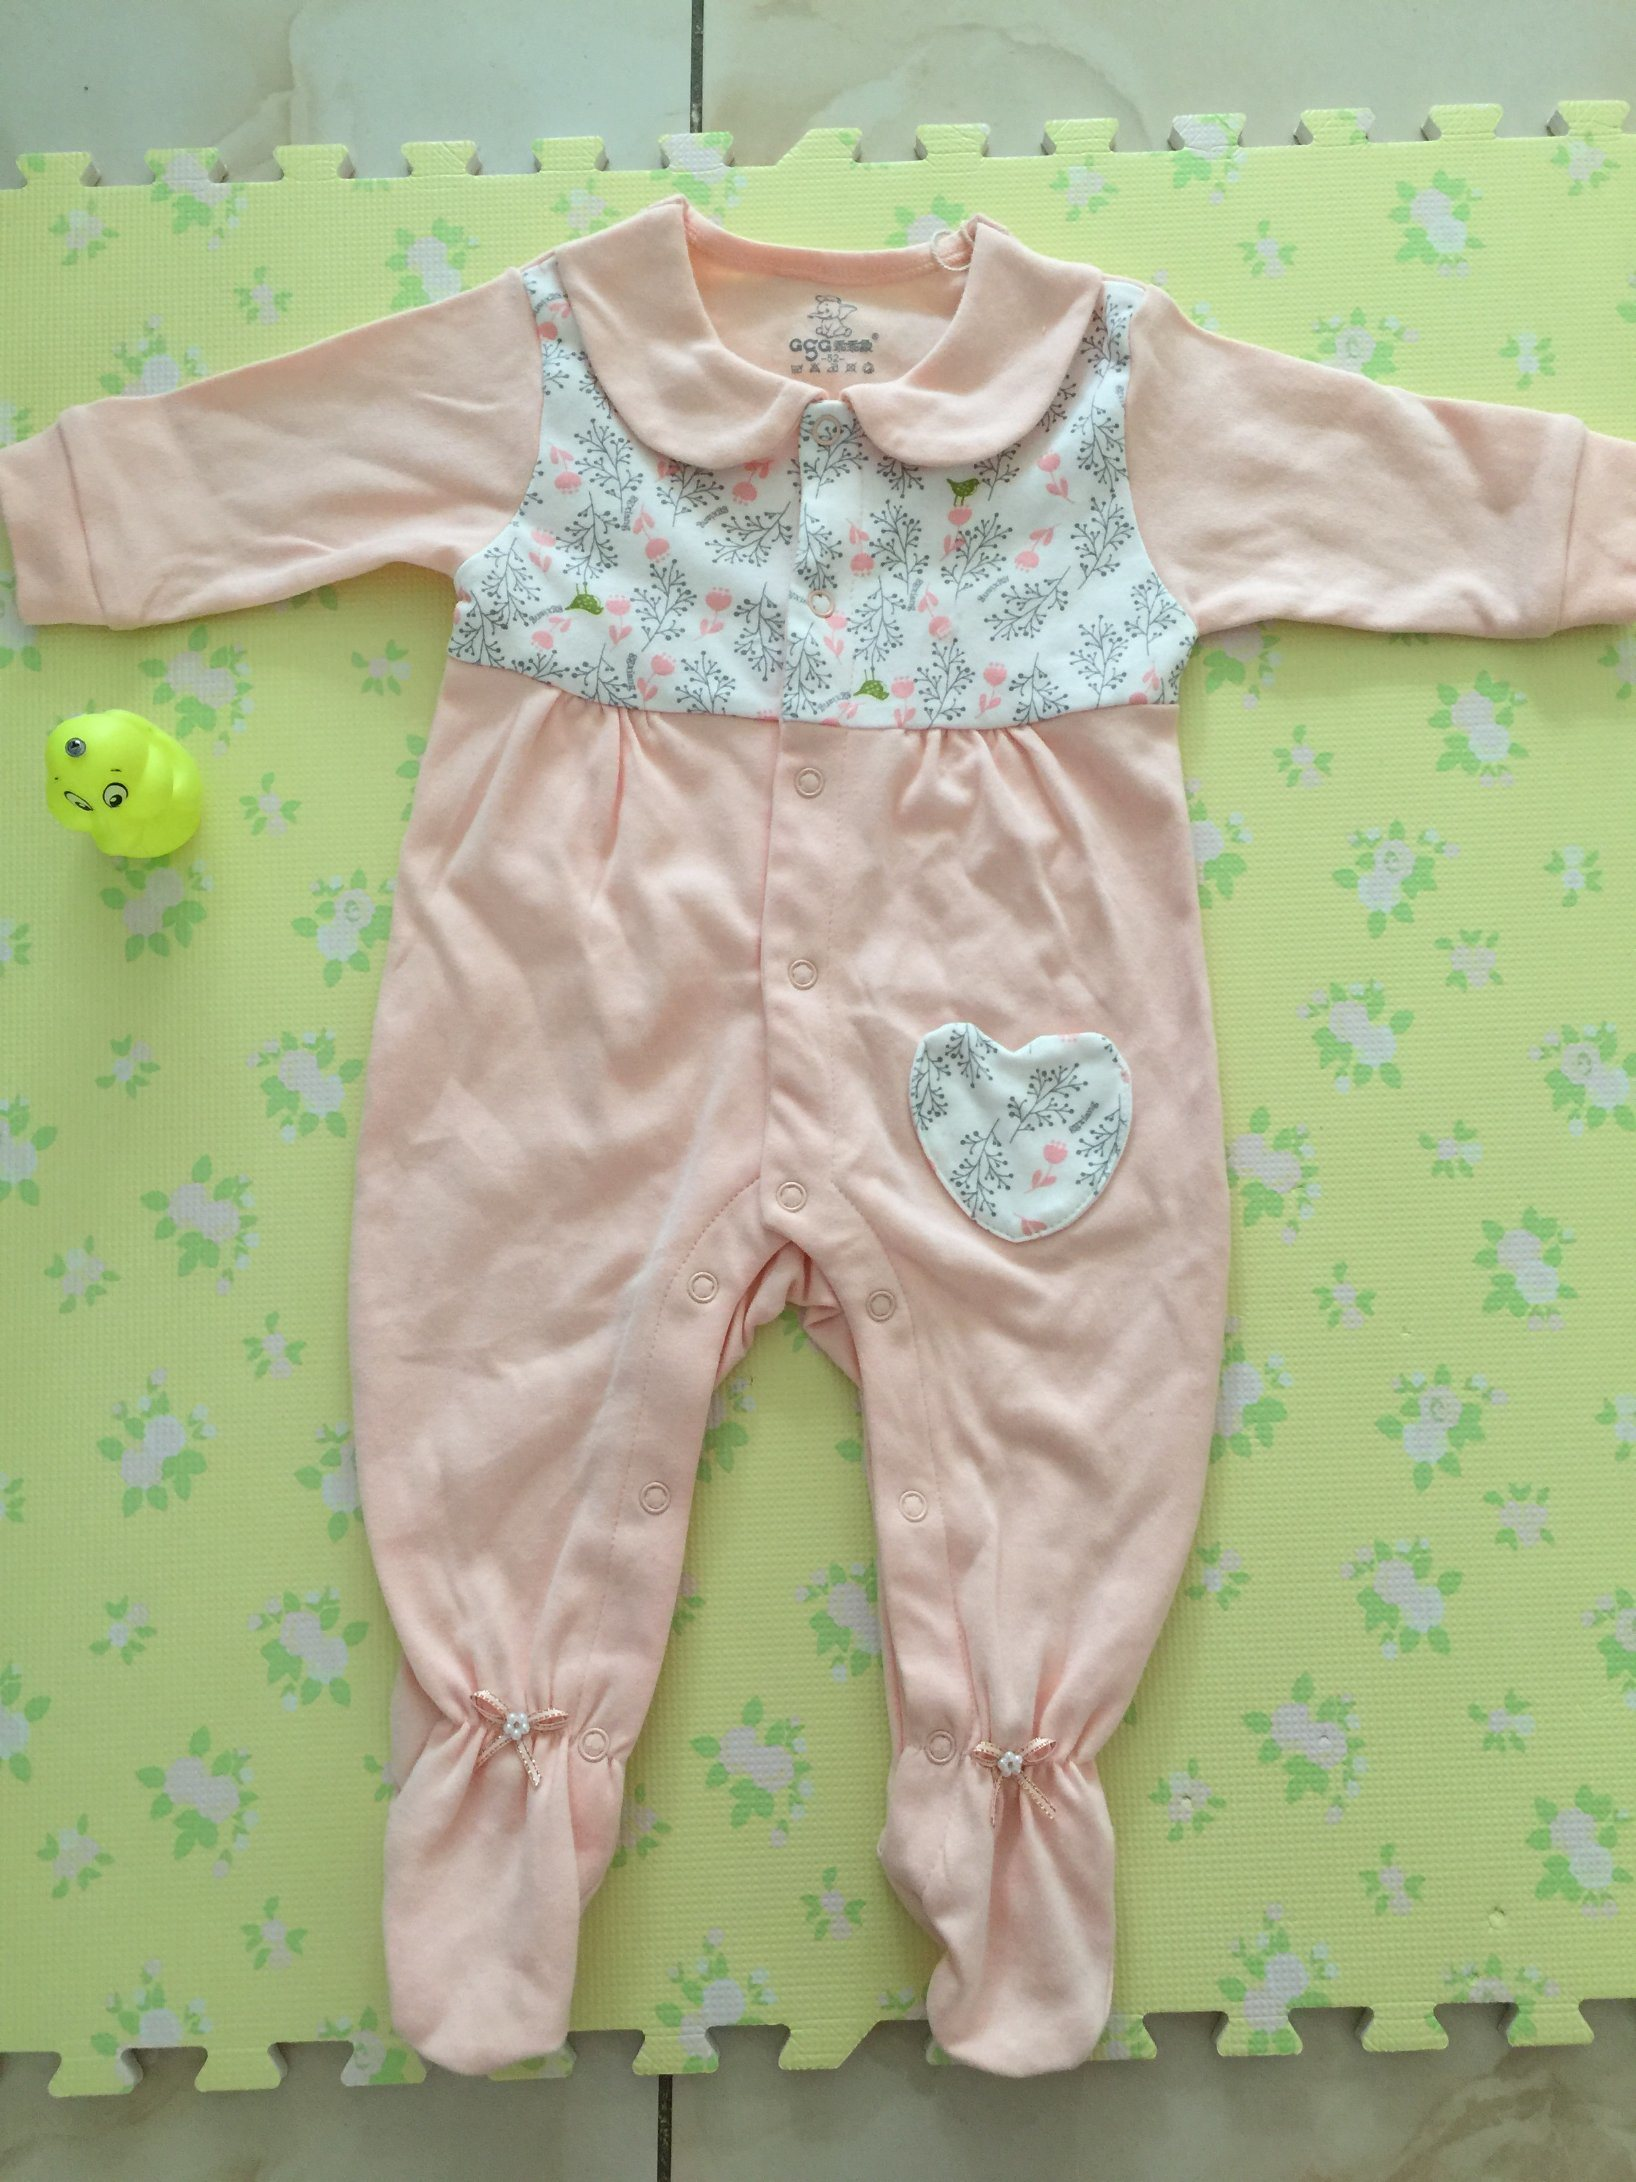 64068e8f0 China Fashion Summer Baby Girl Clothes 100% Comfortable Cotton Cute ...